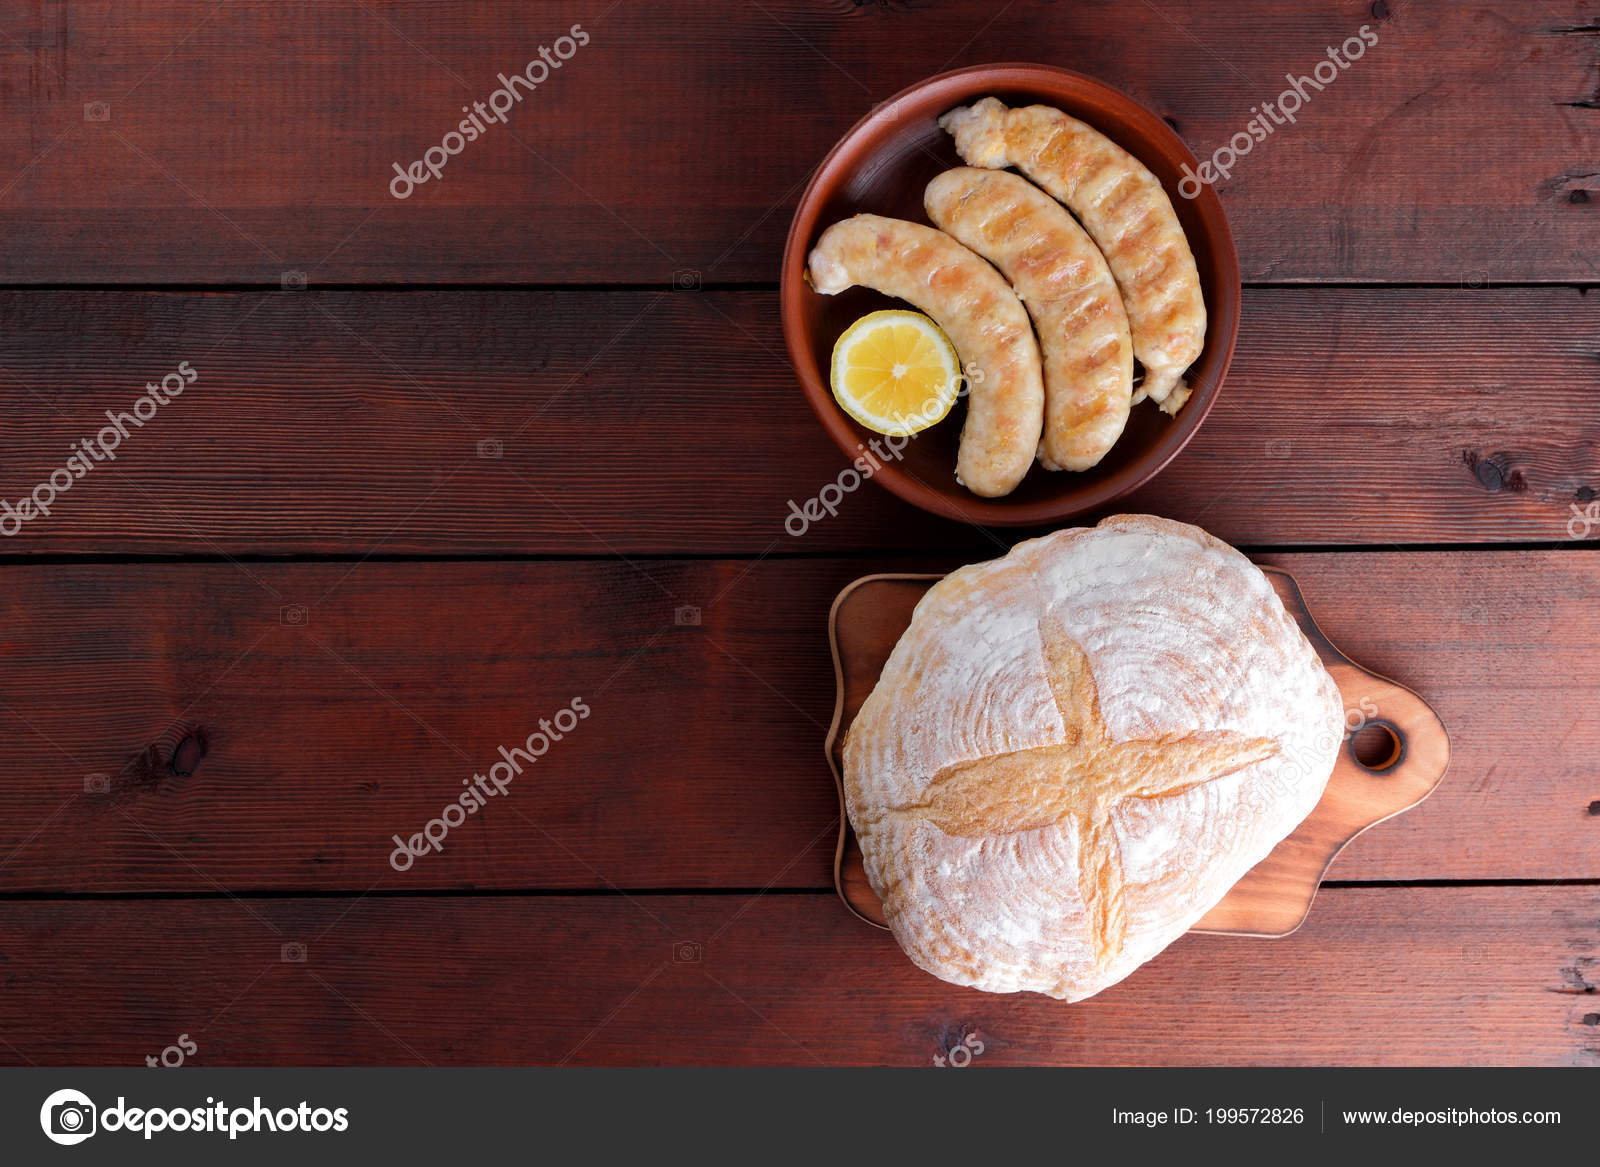 Baguette En Bois Decorative sausages cooked grill dark wooden background chicken